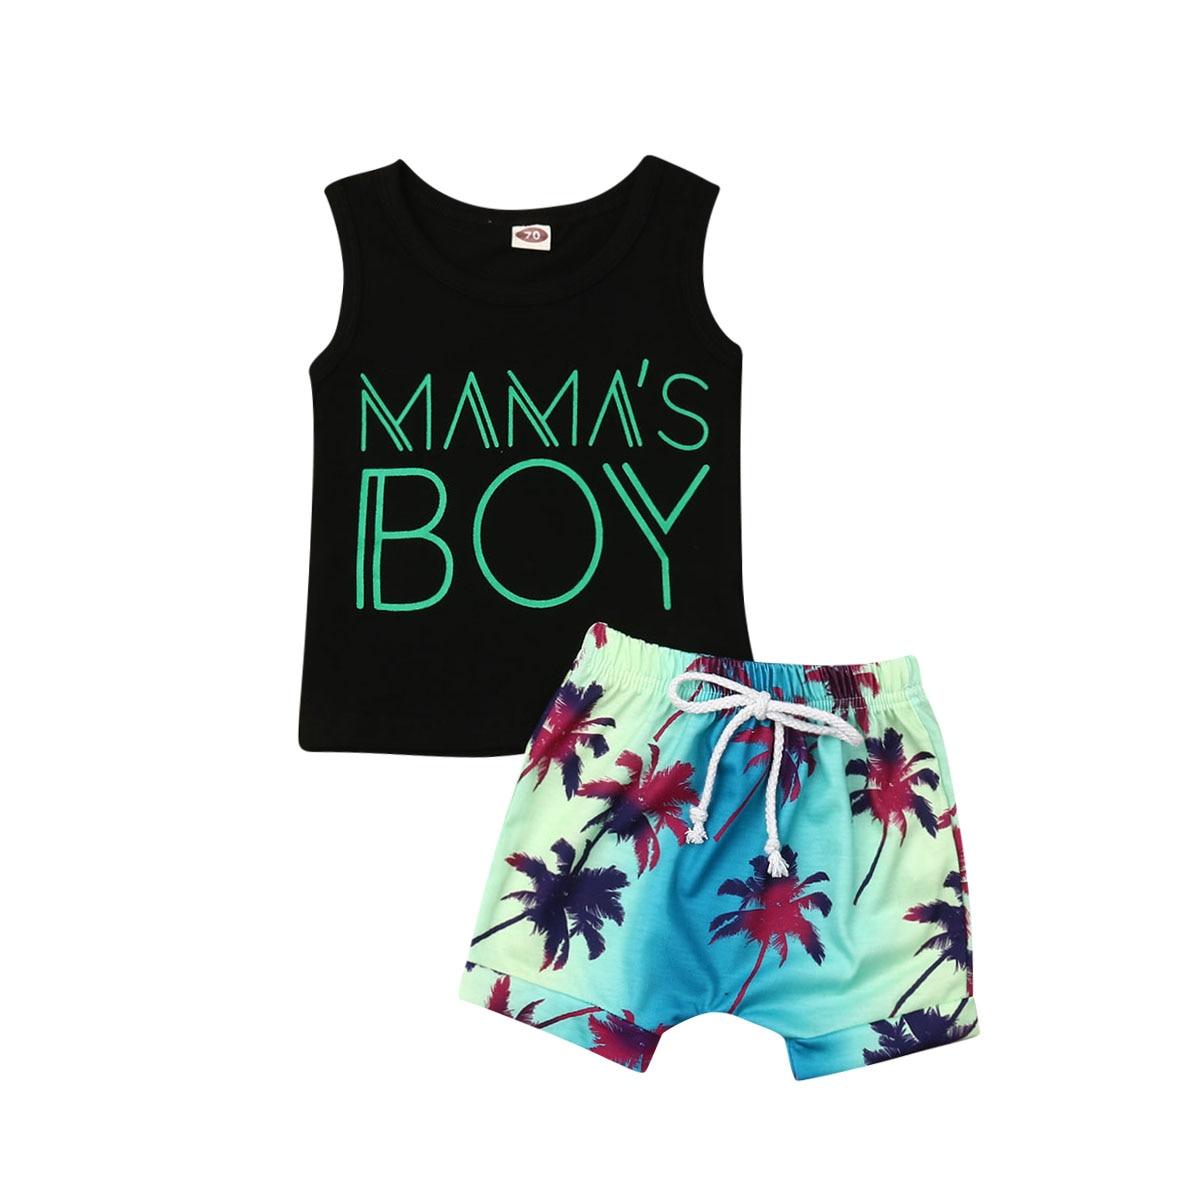 Mama's Boy Newborn Baby Boys Sleeveless Vest Shorts Pant Beach Holiday Summer Clothing Set 0-24M